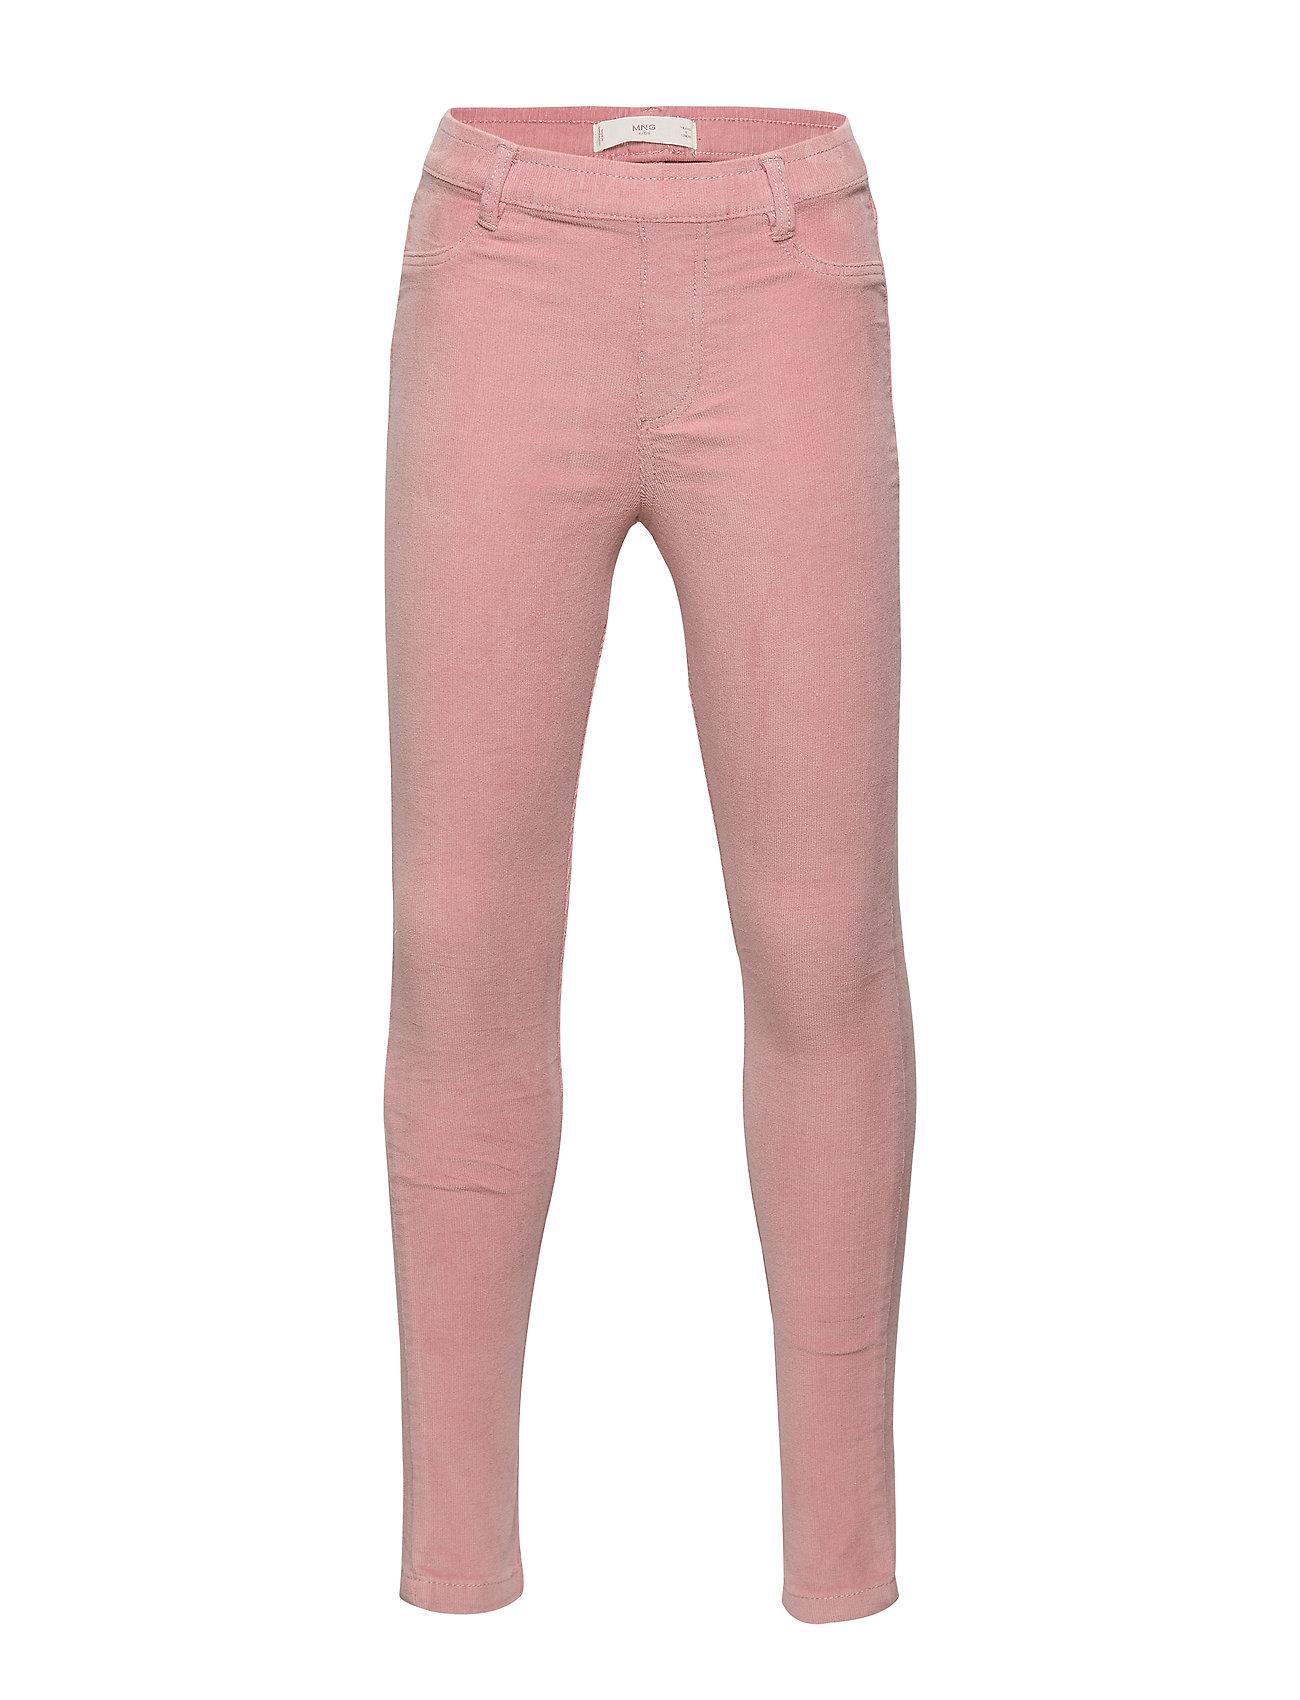 Mango Kids Slim-fit corduroy trousers - PINK